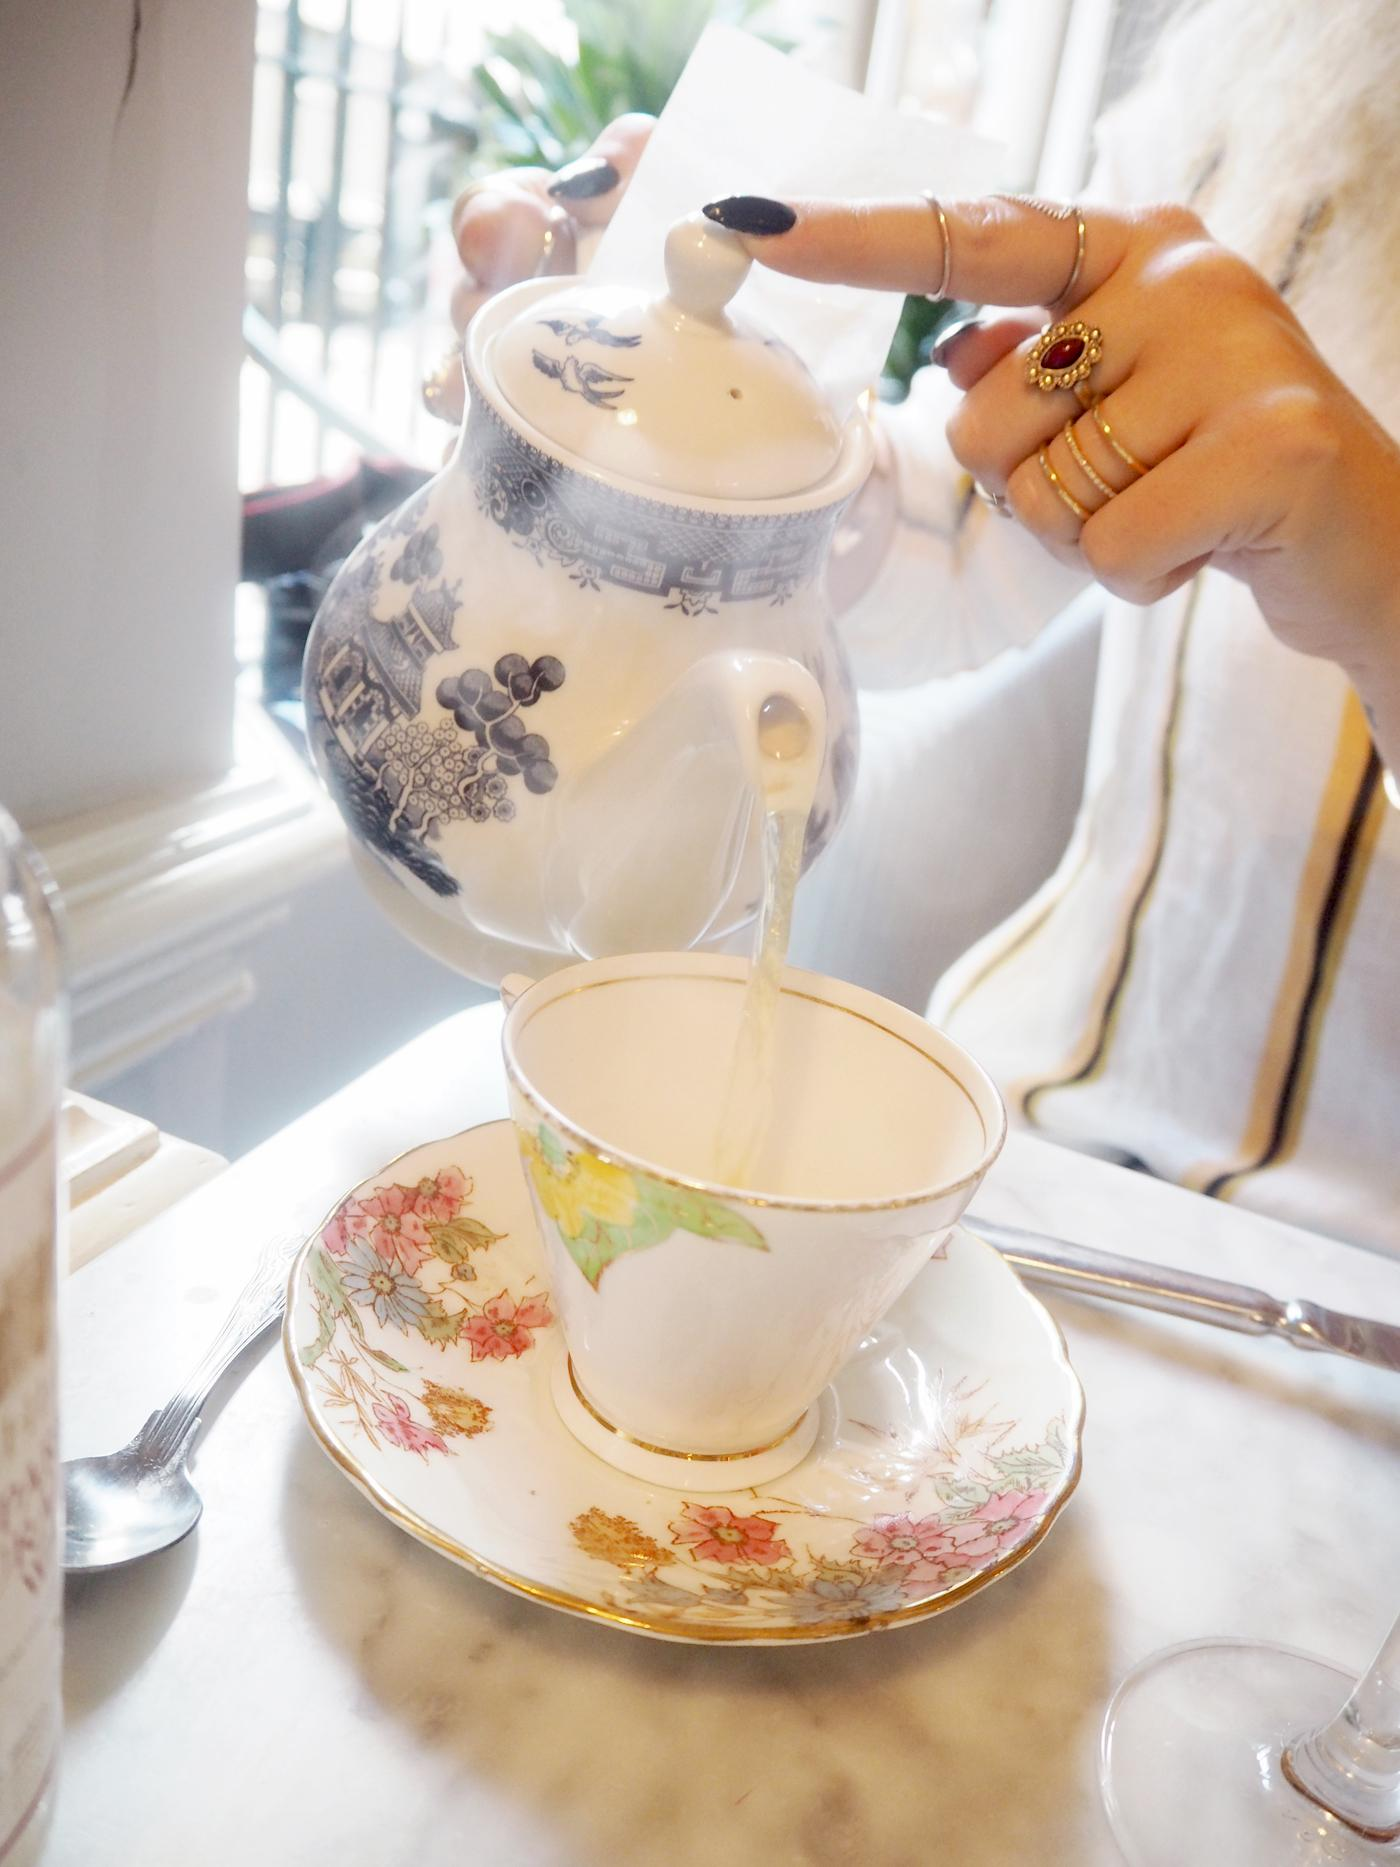 KETTNERS-AFTERNOON-TEA